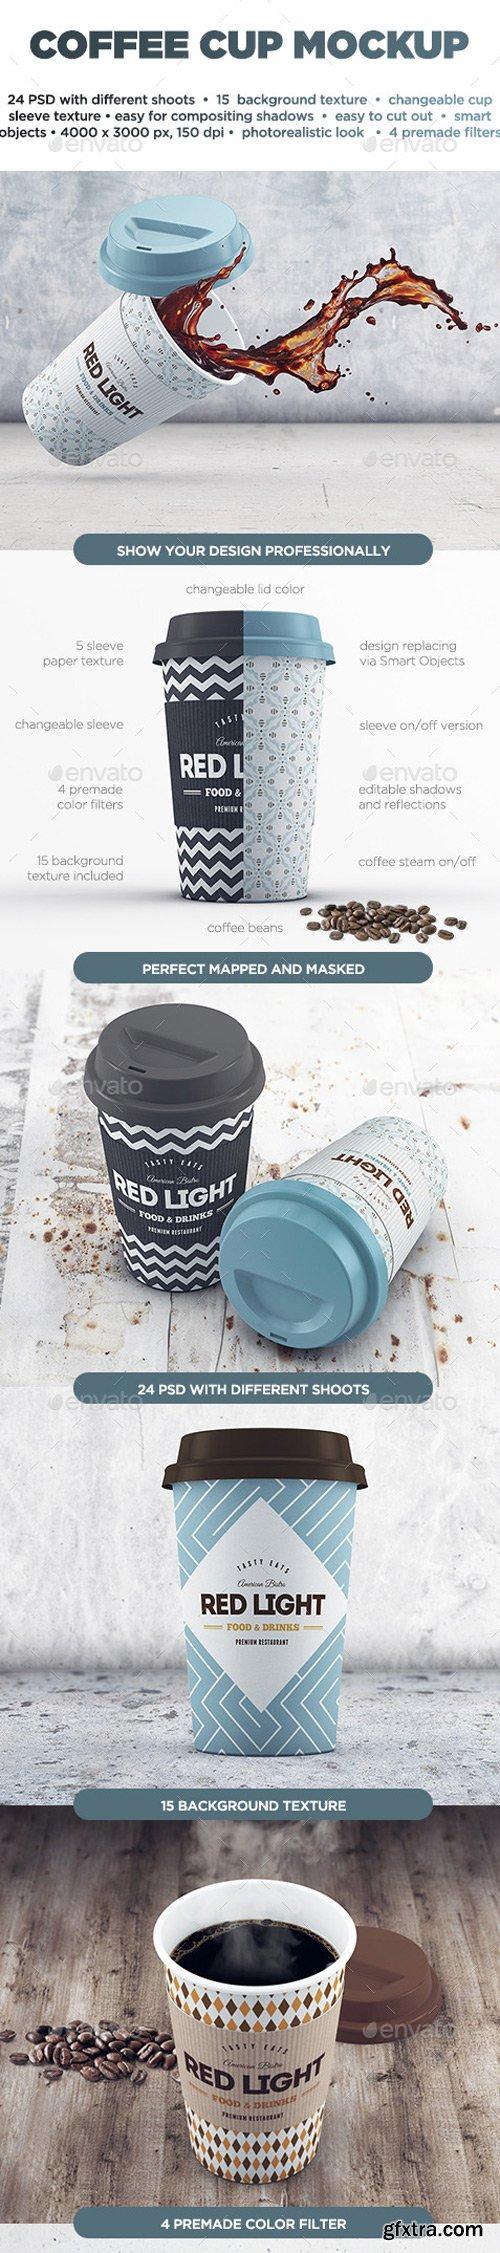 Graphicriver - 13081348 Coffee Cup MockUp